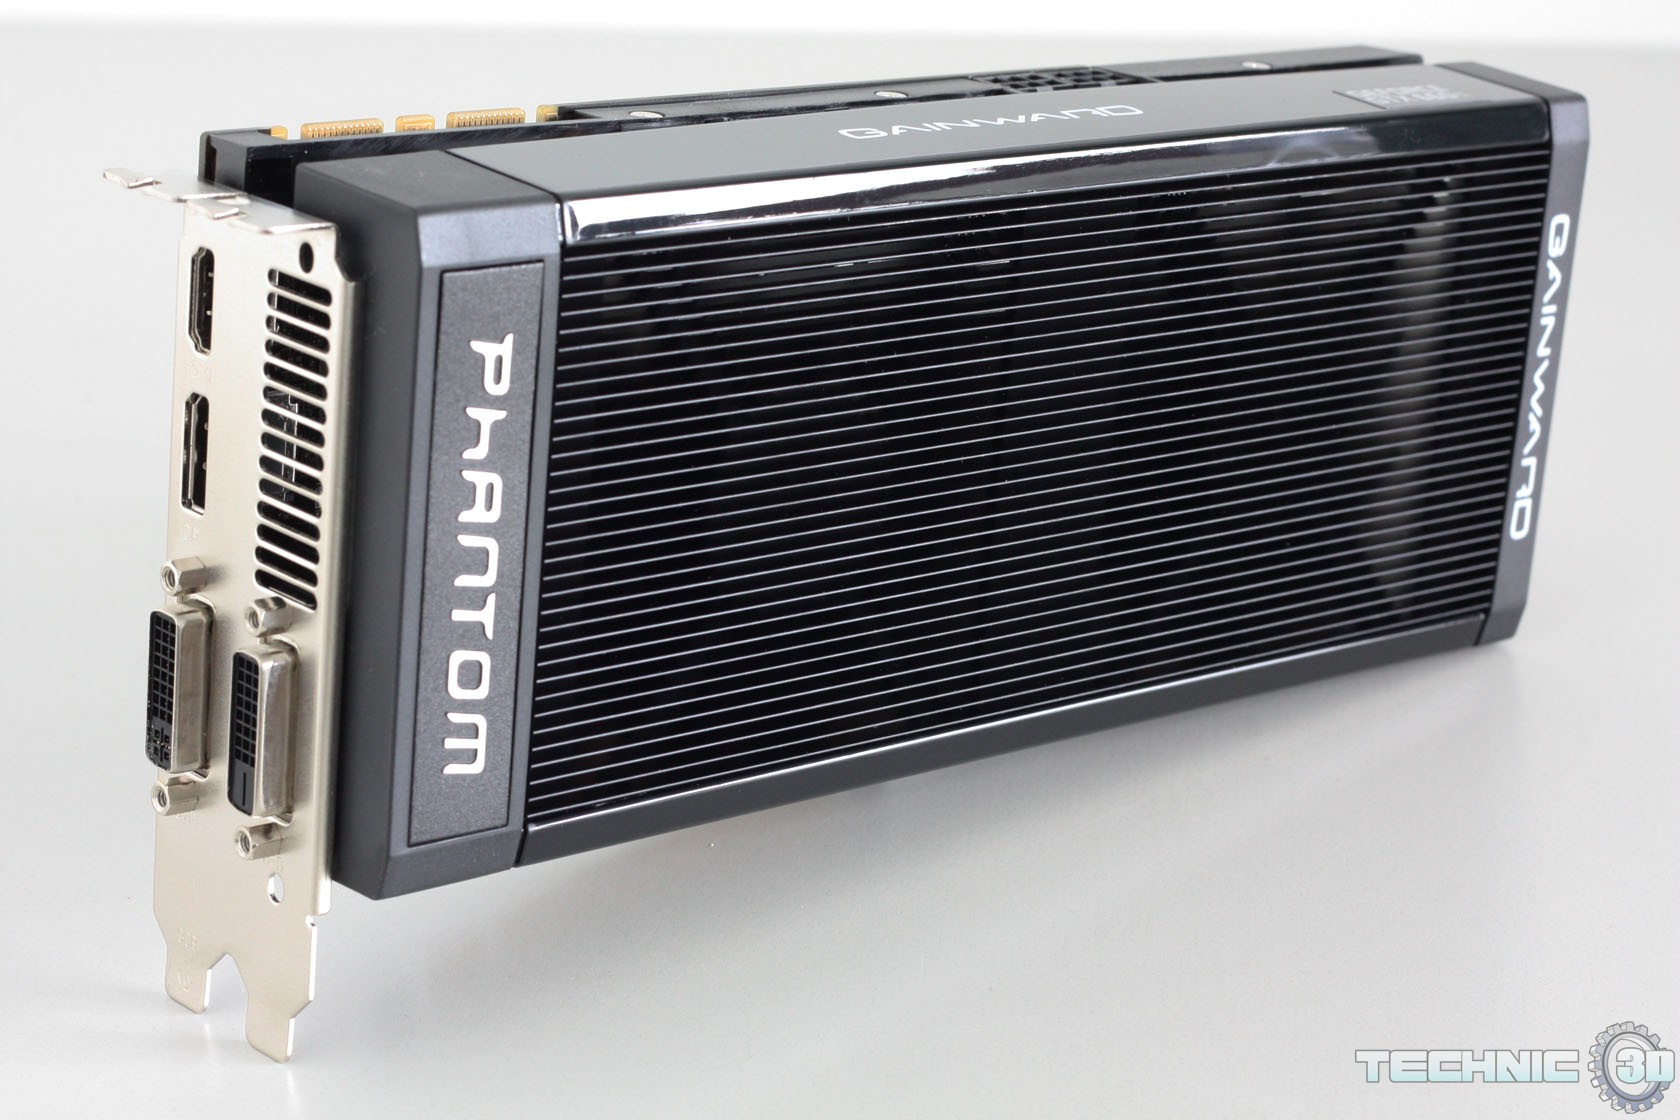 VENDO 2 SCHEDE VIDEO GAINWARD GTX 660 IT Phantom  Gainward_GeForce_GTX_660_Ti_Phantom_5